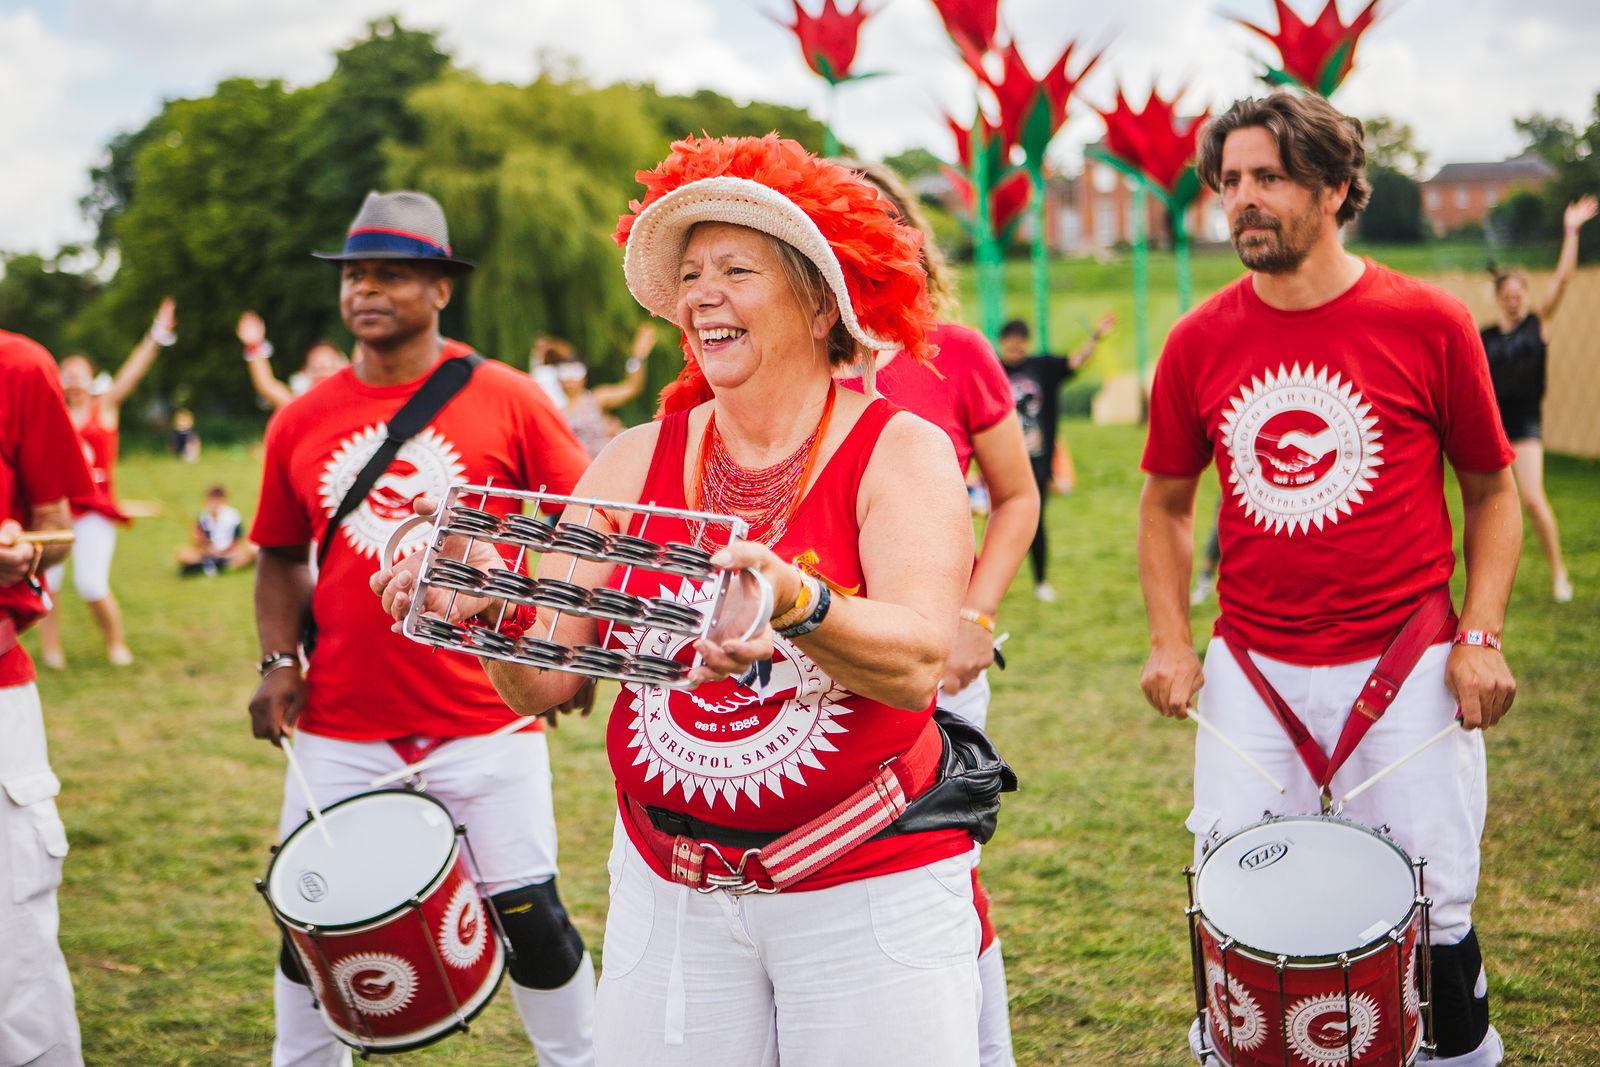 Bristol Samba